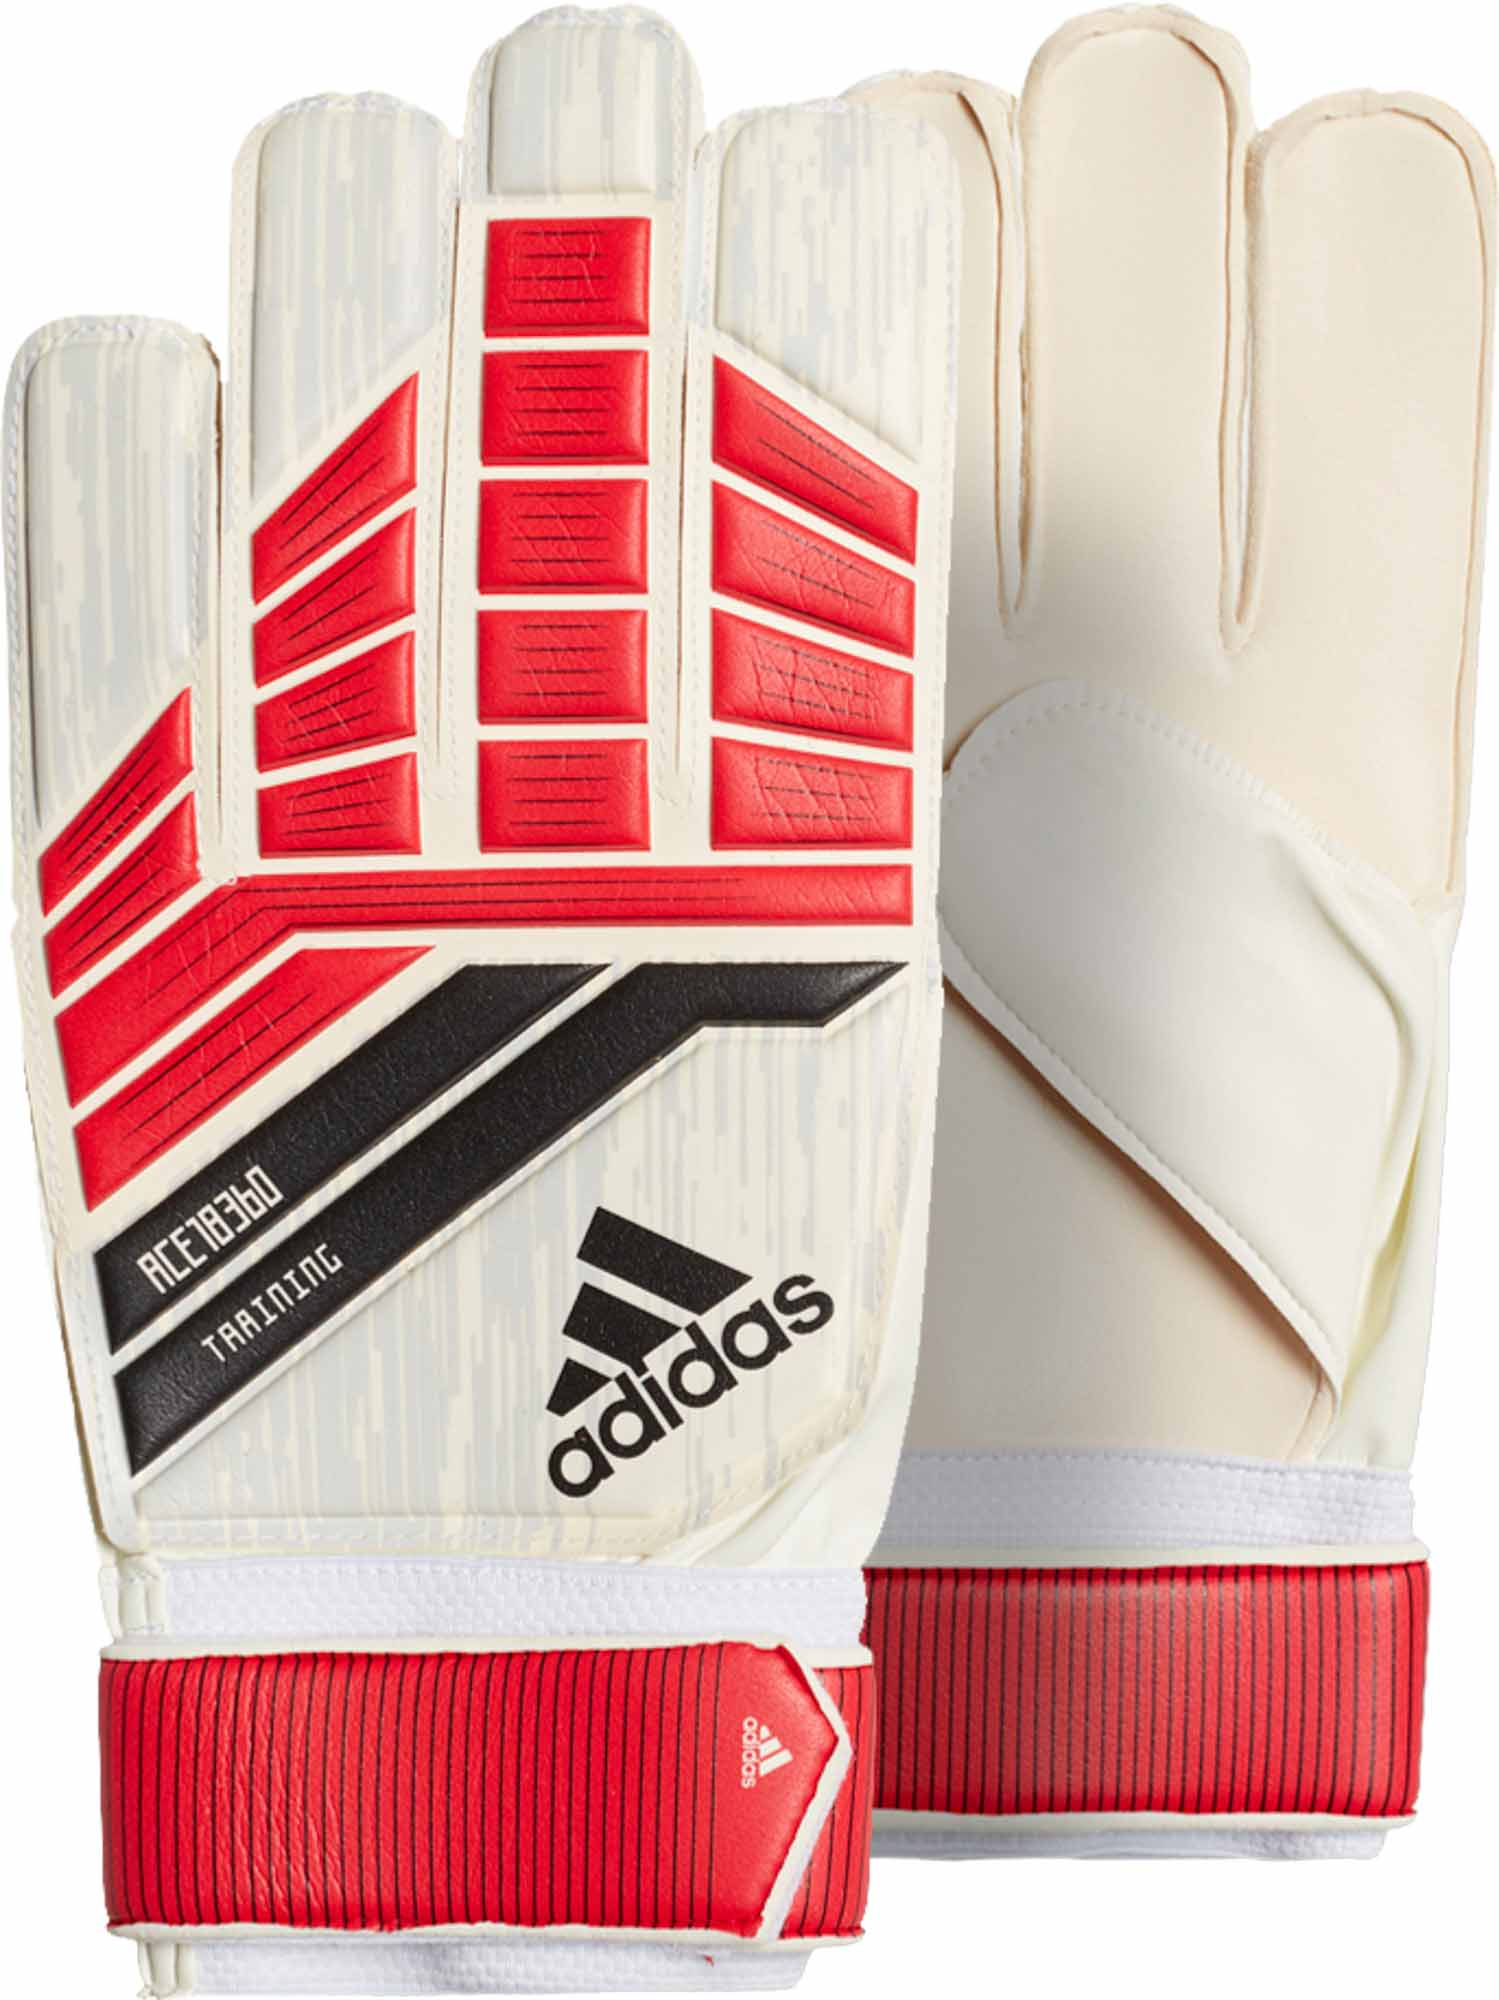 adidas Predator Training Goalkeeper Gloves - Real CoralBlack